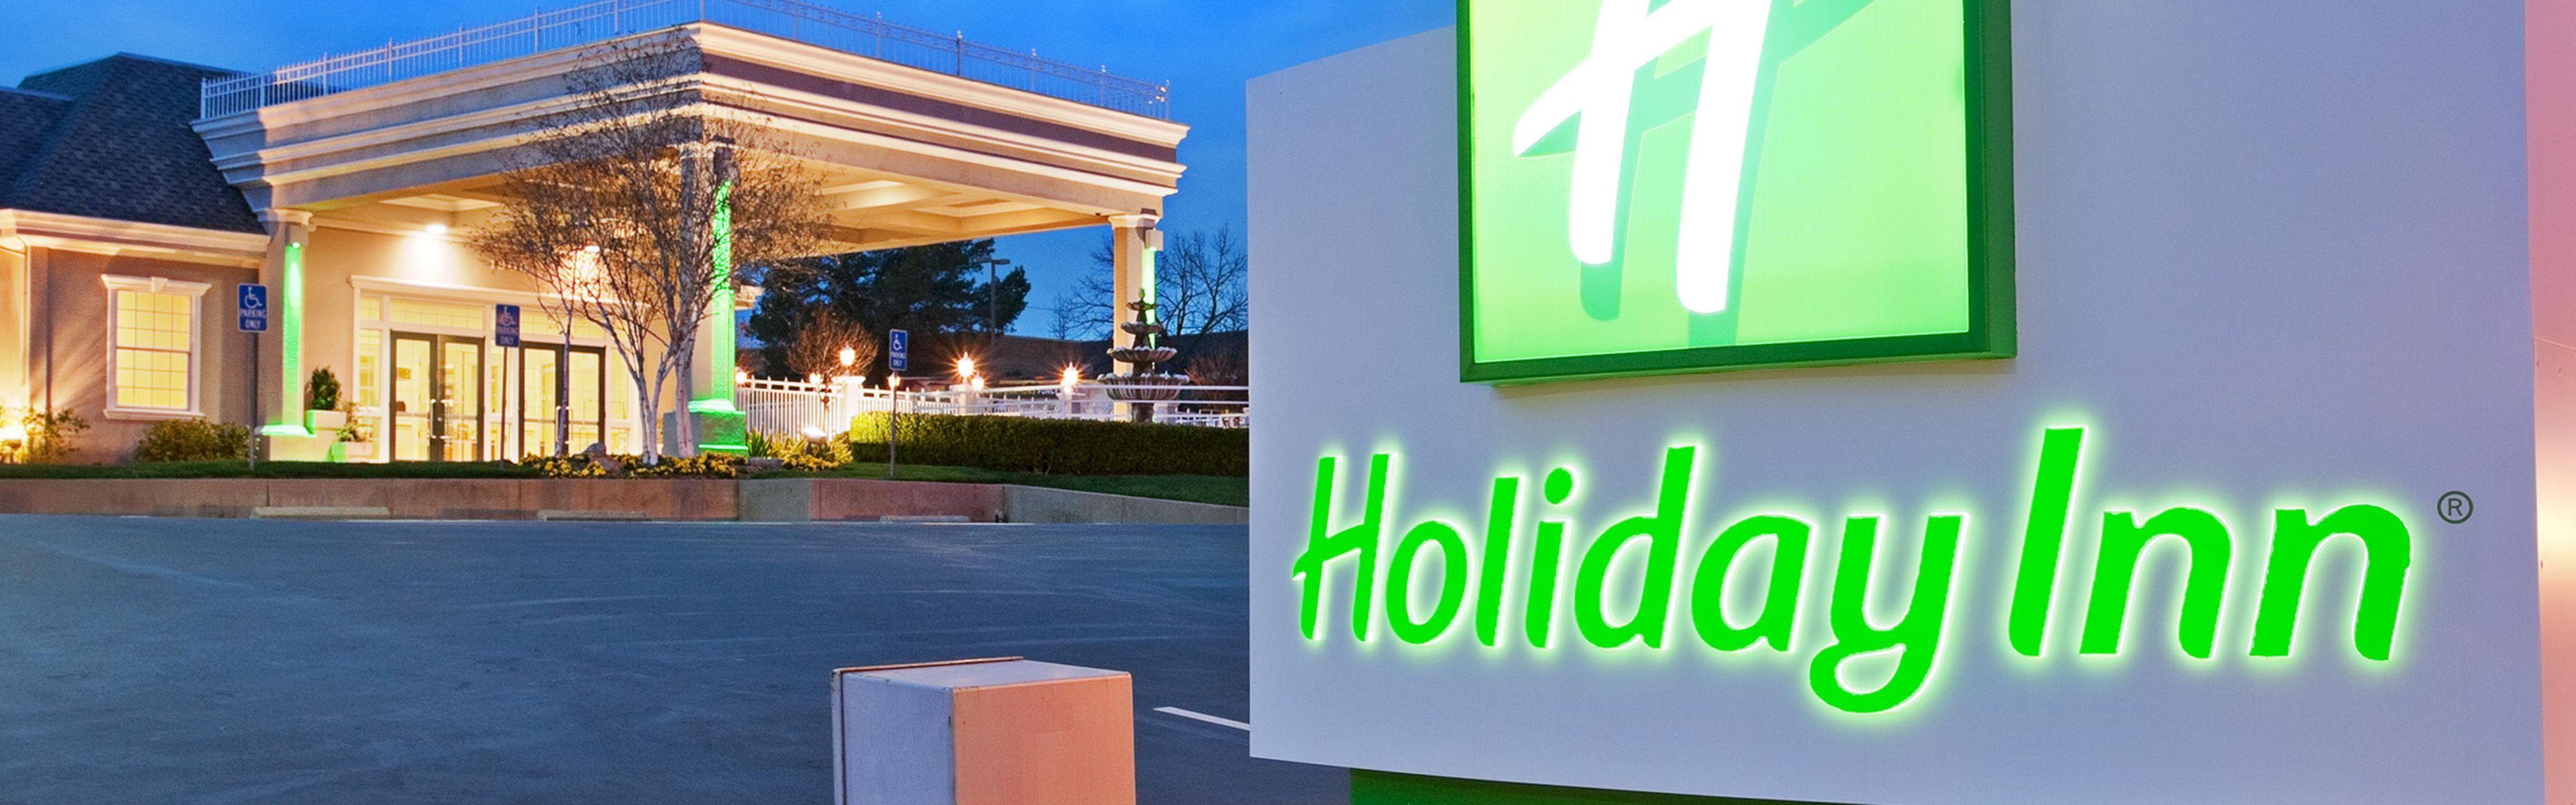 Holiday Inn Redding image 0